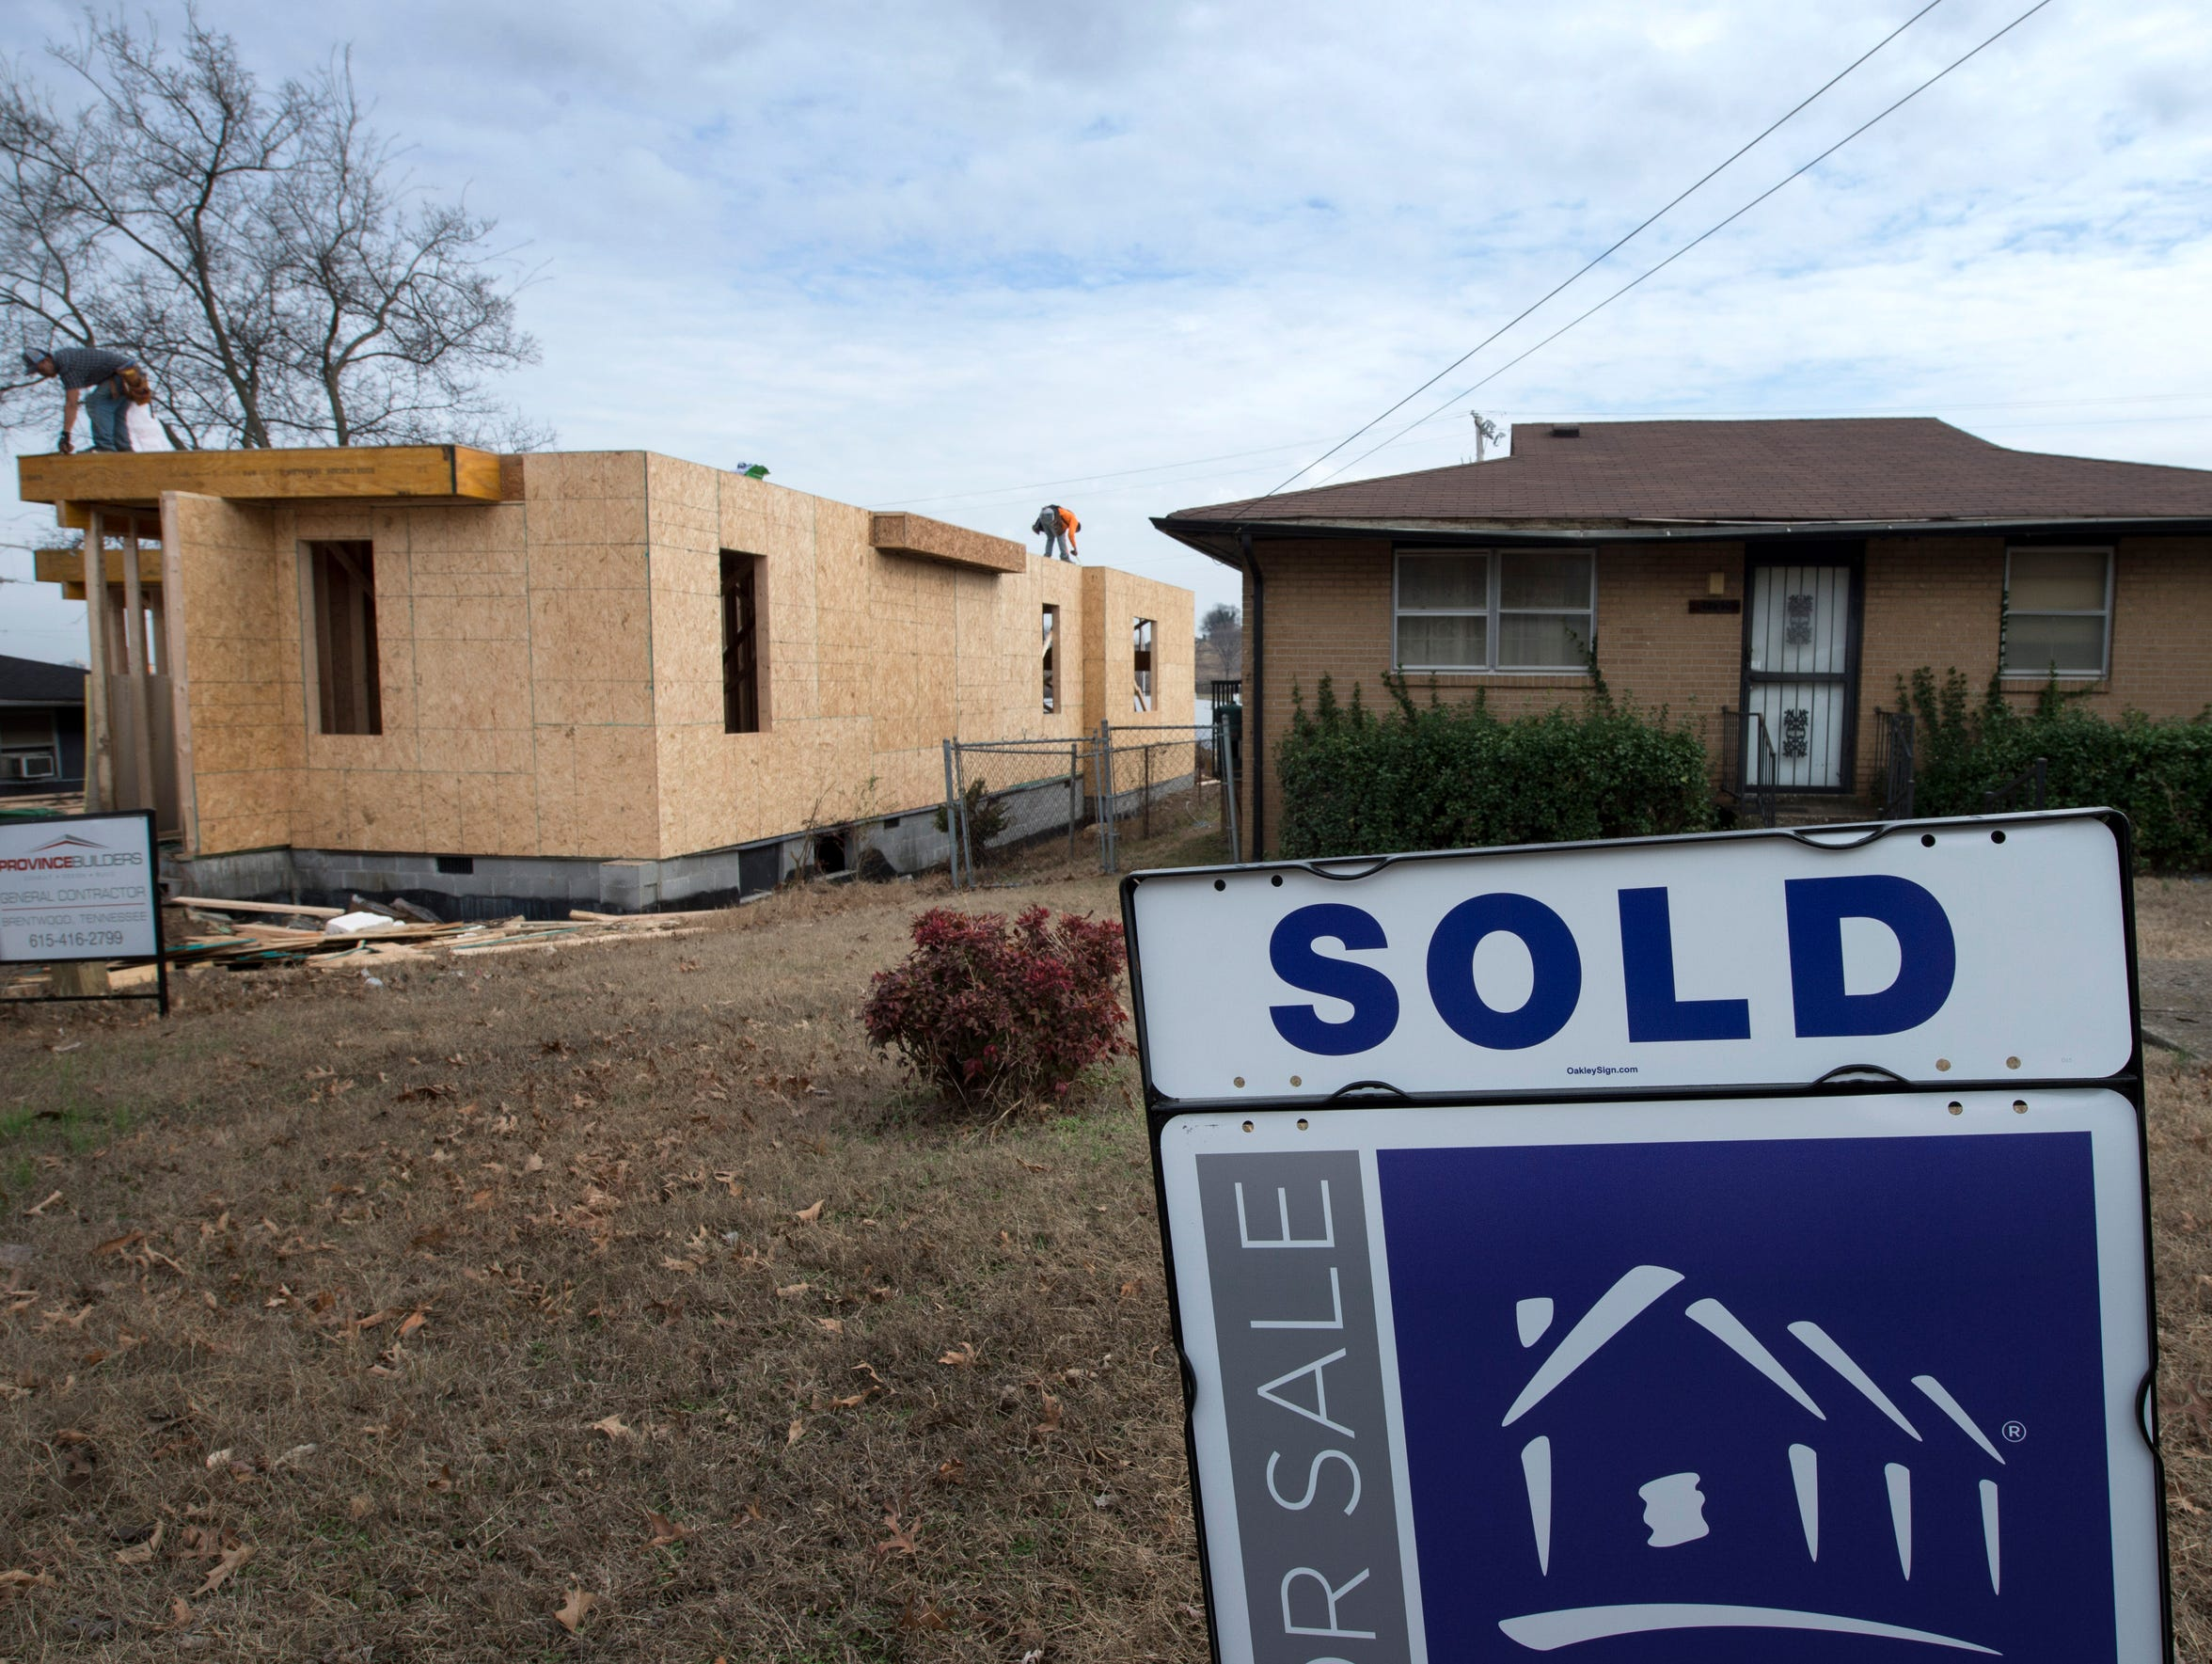 New houses go up along Ninth Avenue in a neighborhood